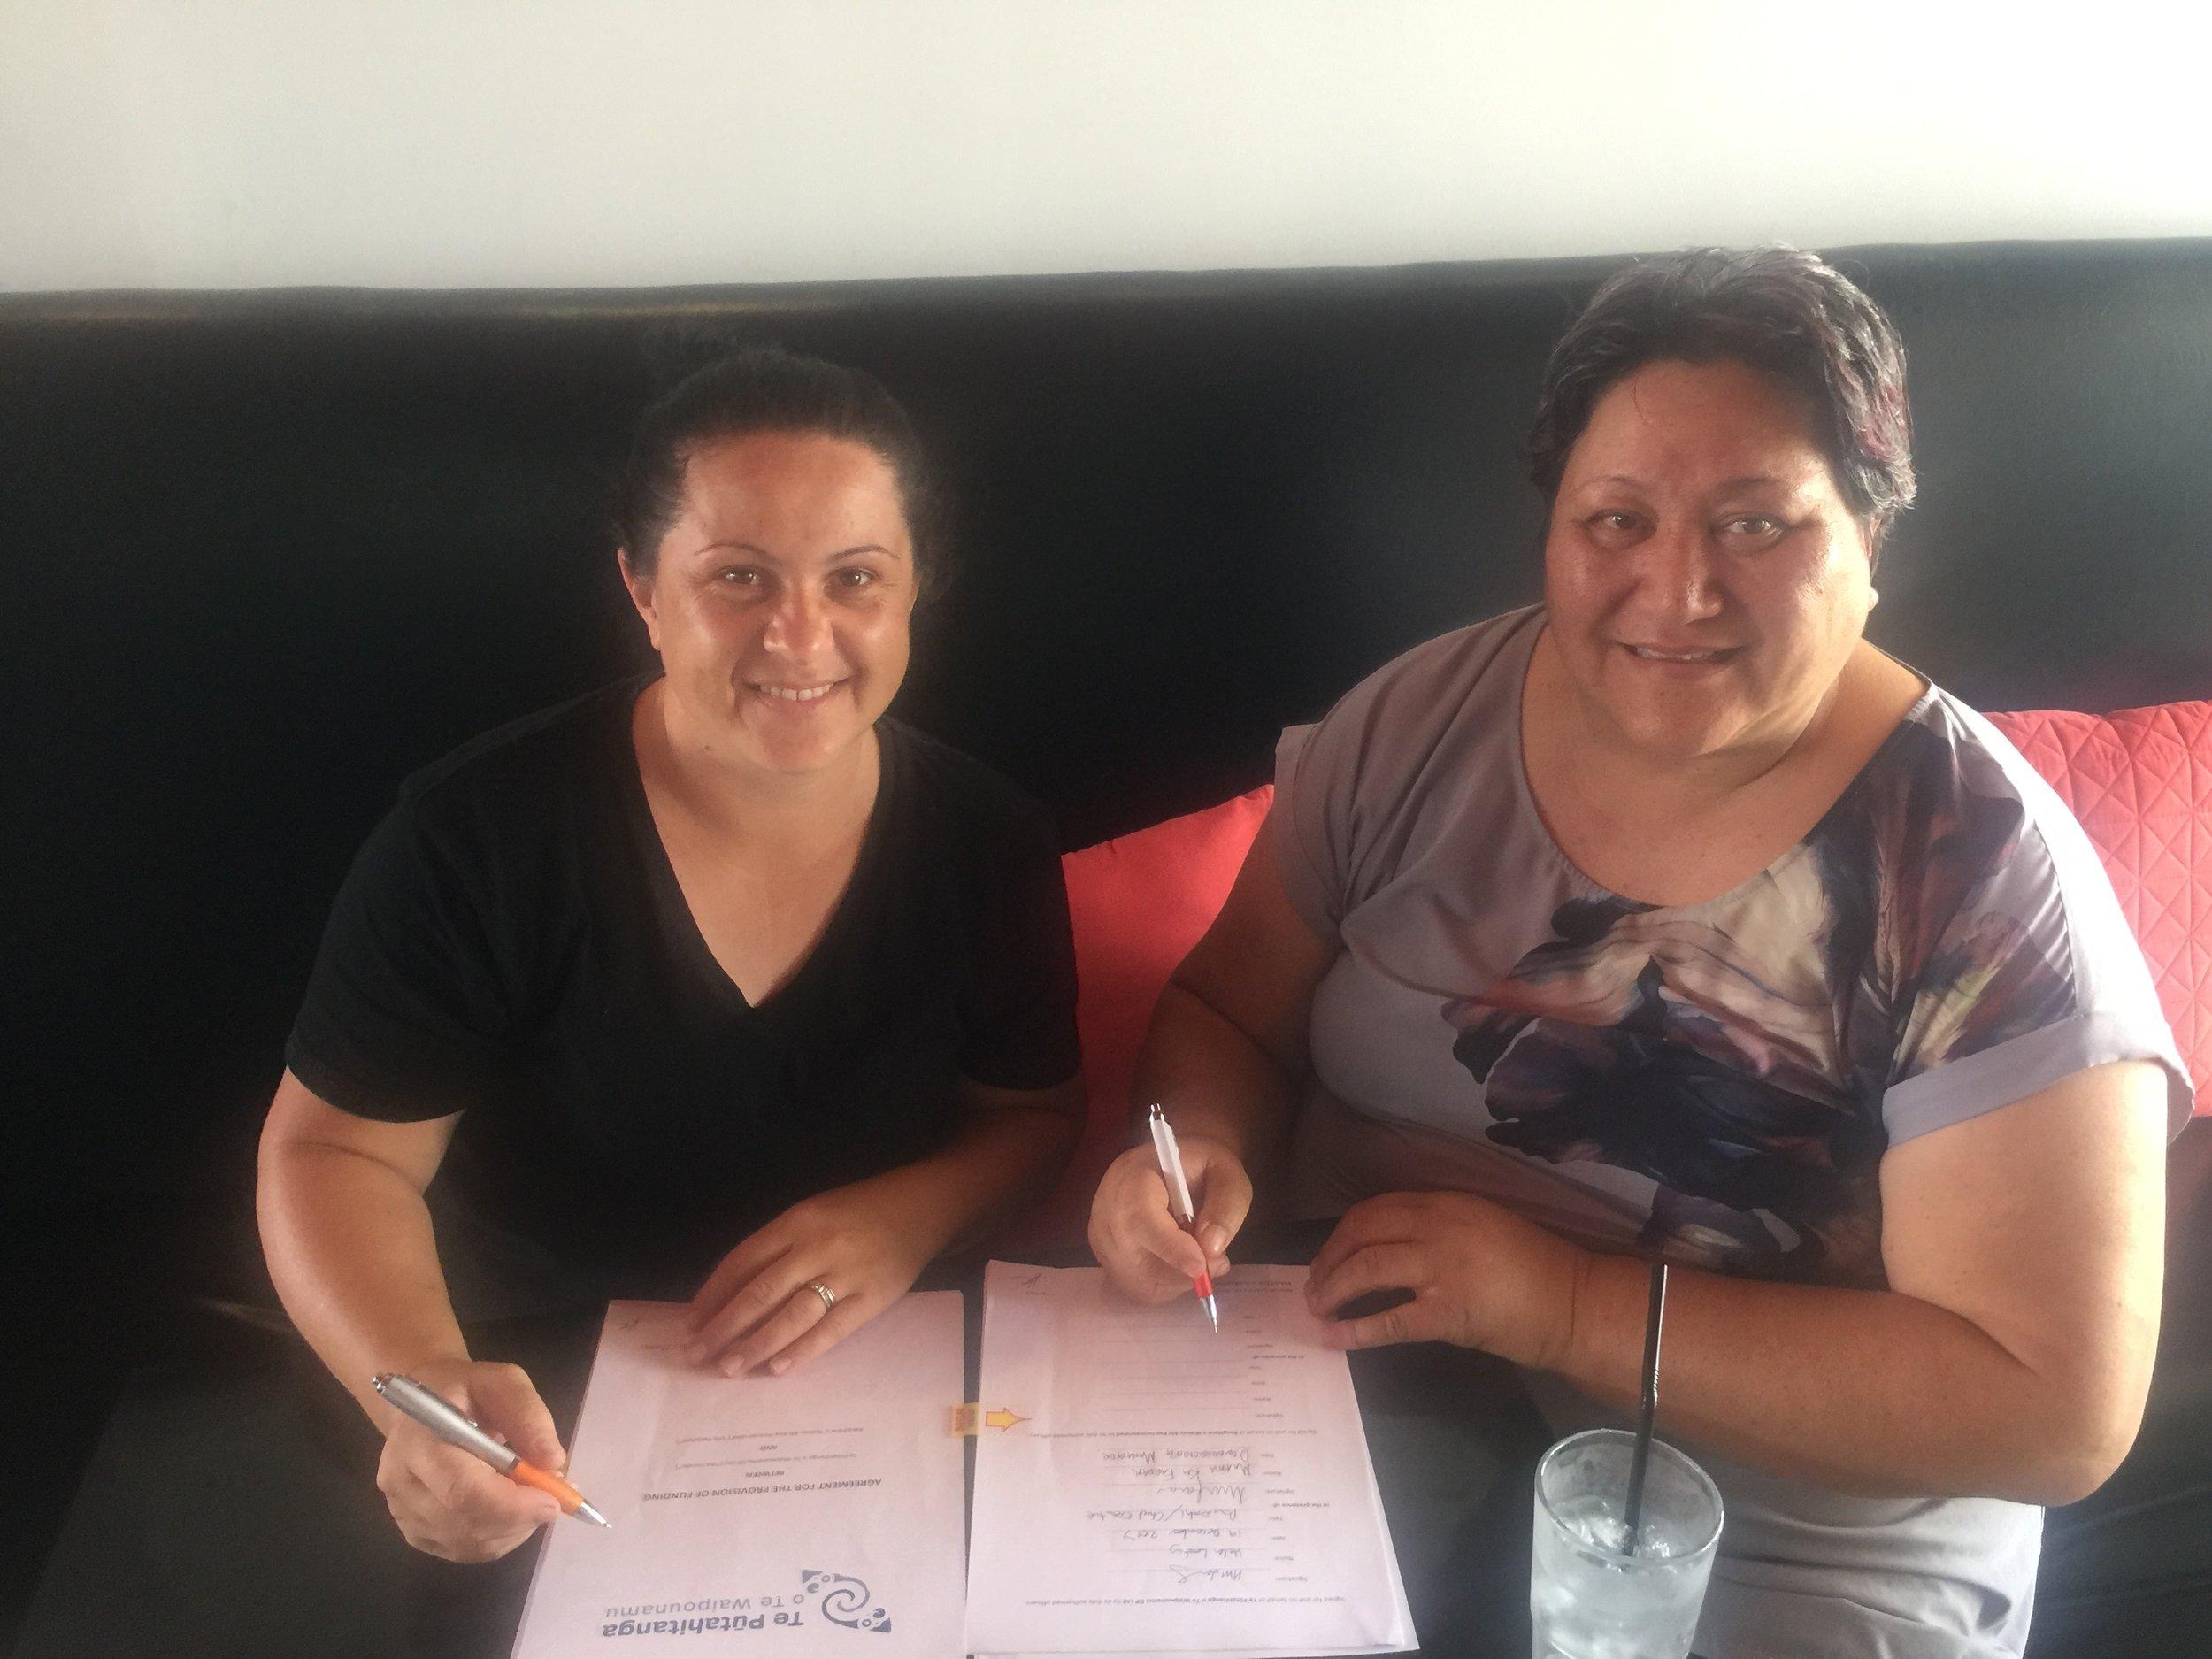 Milly Finlay and Sue Parish from Rangitane ki Wairau Ahi Kaa signing their Agreement.